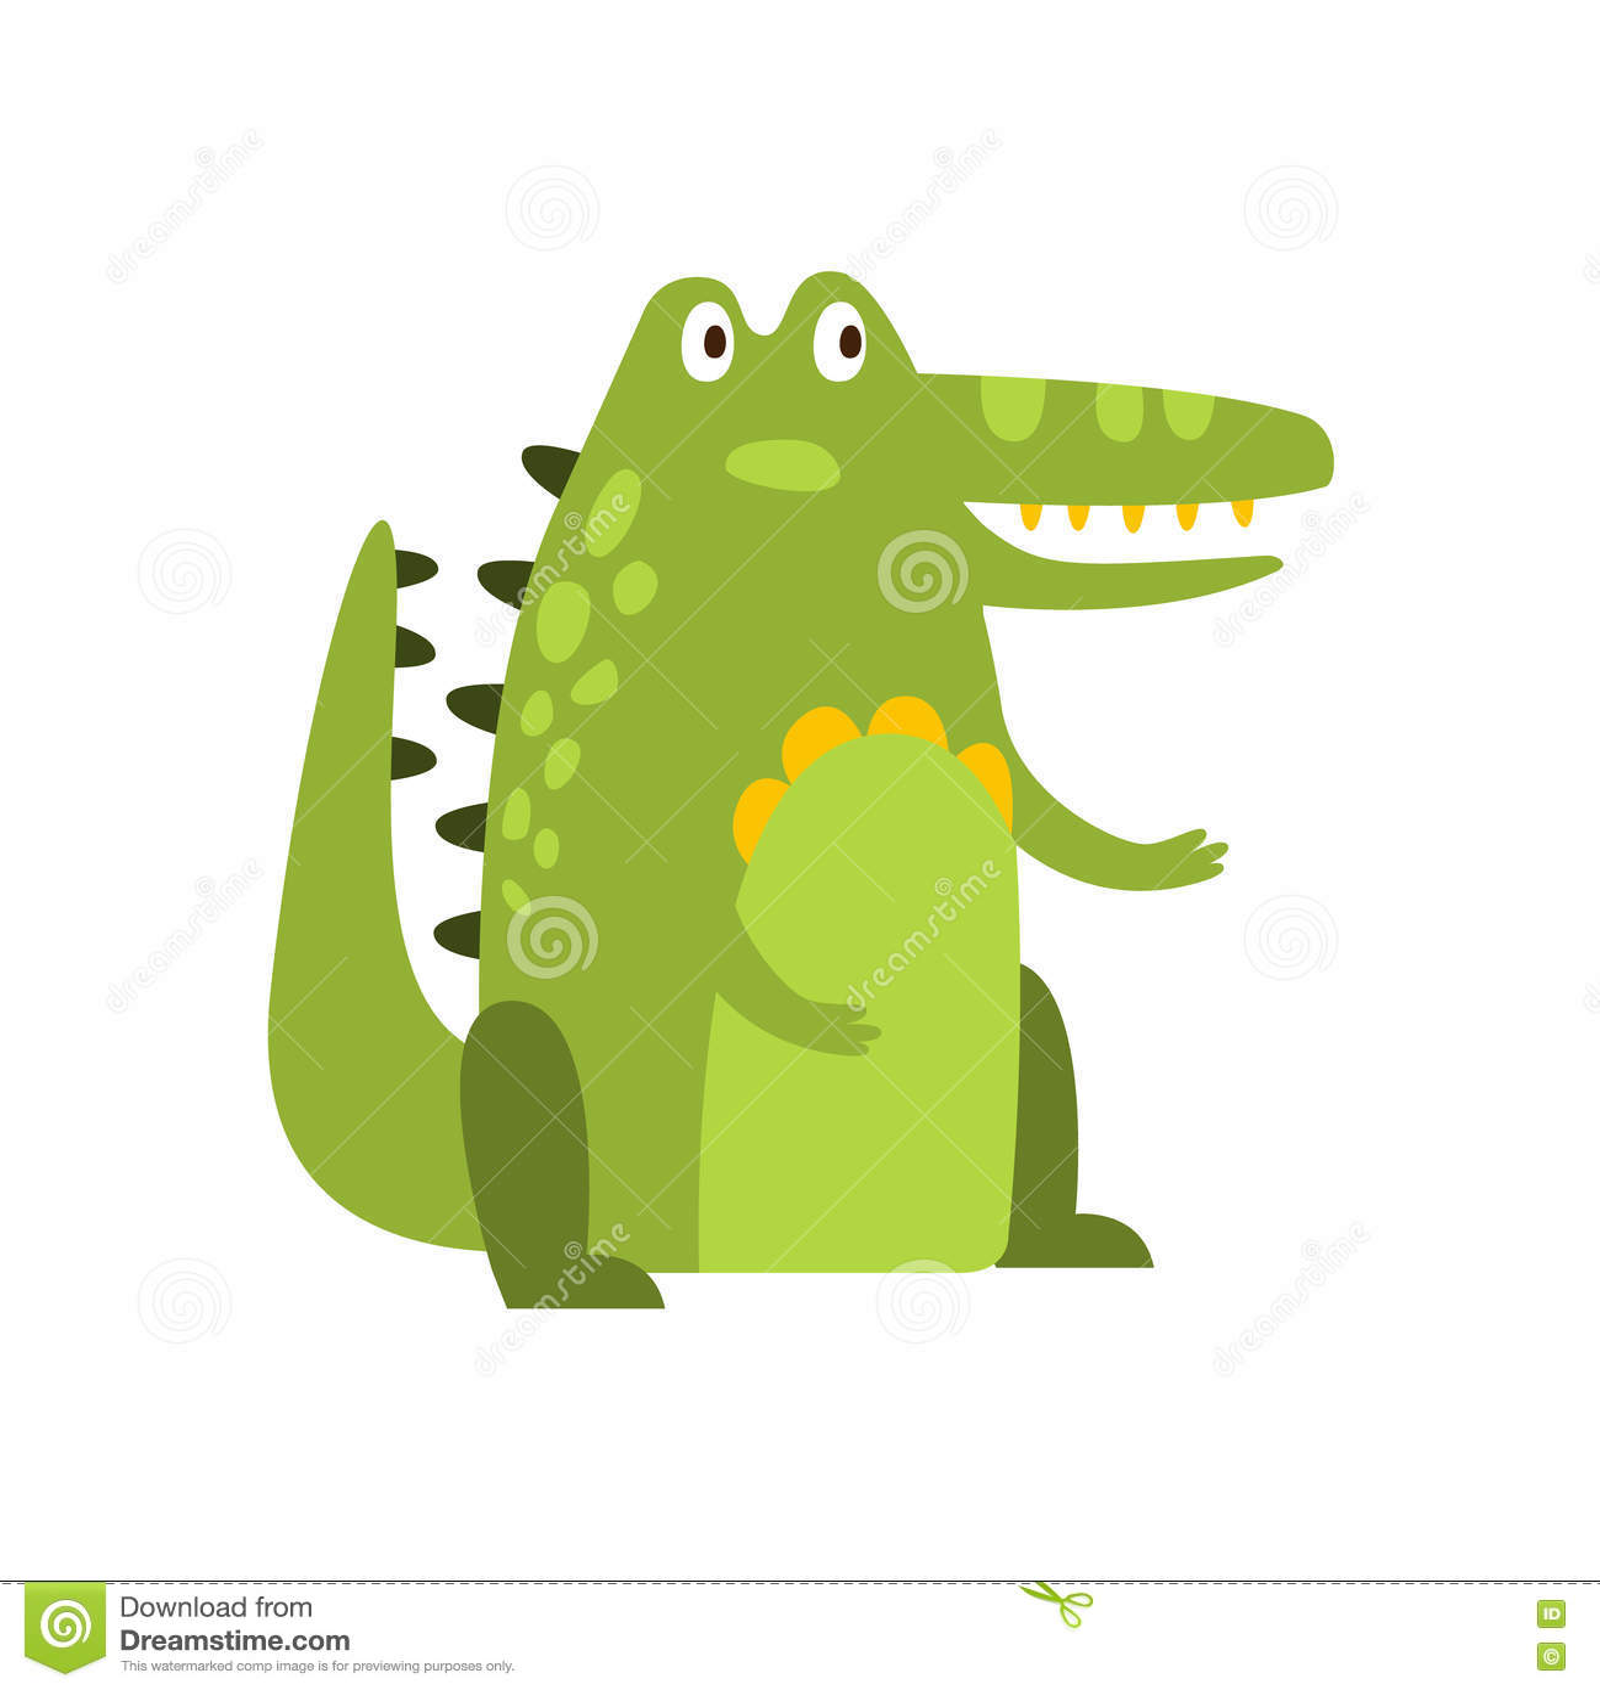 crocodile sitting straight like man flat cartoon green friendly